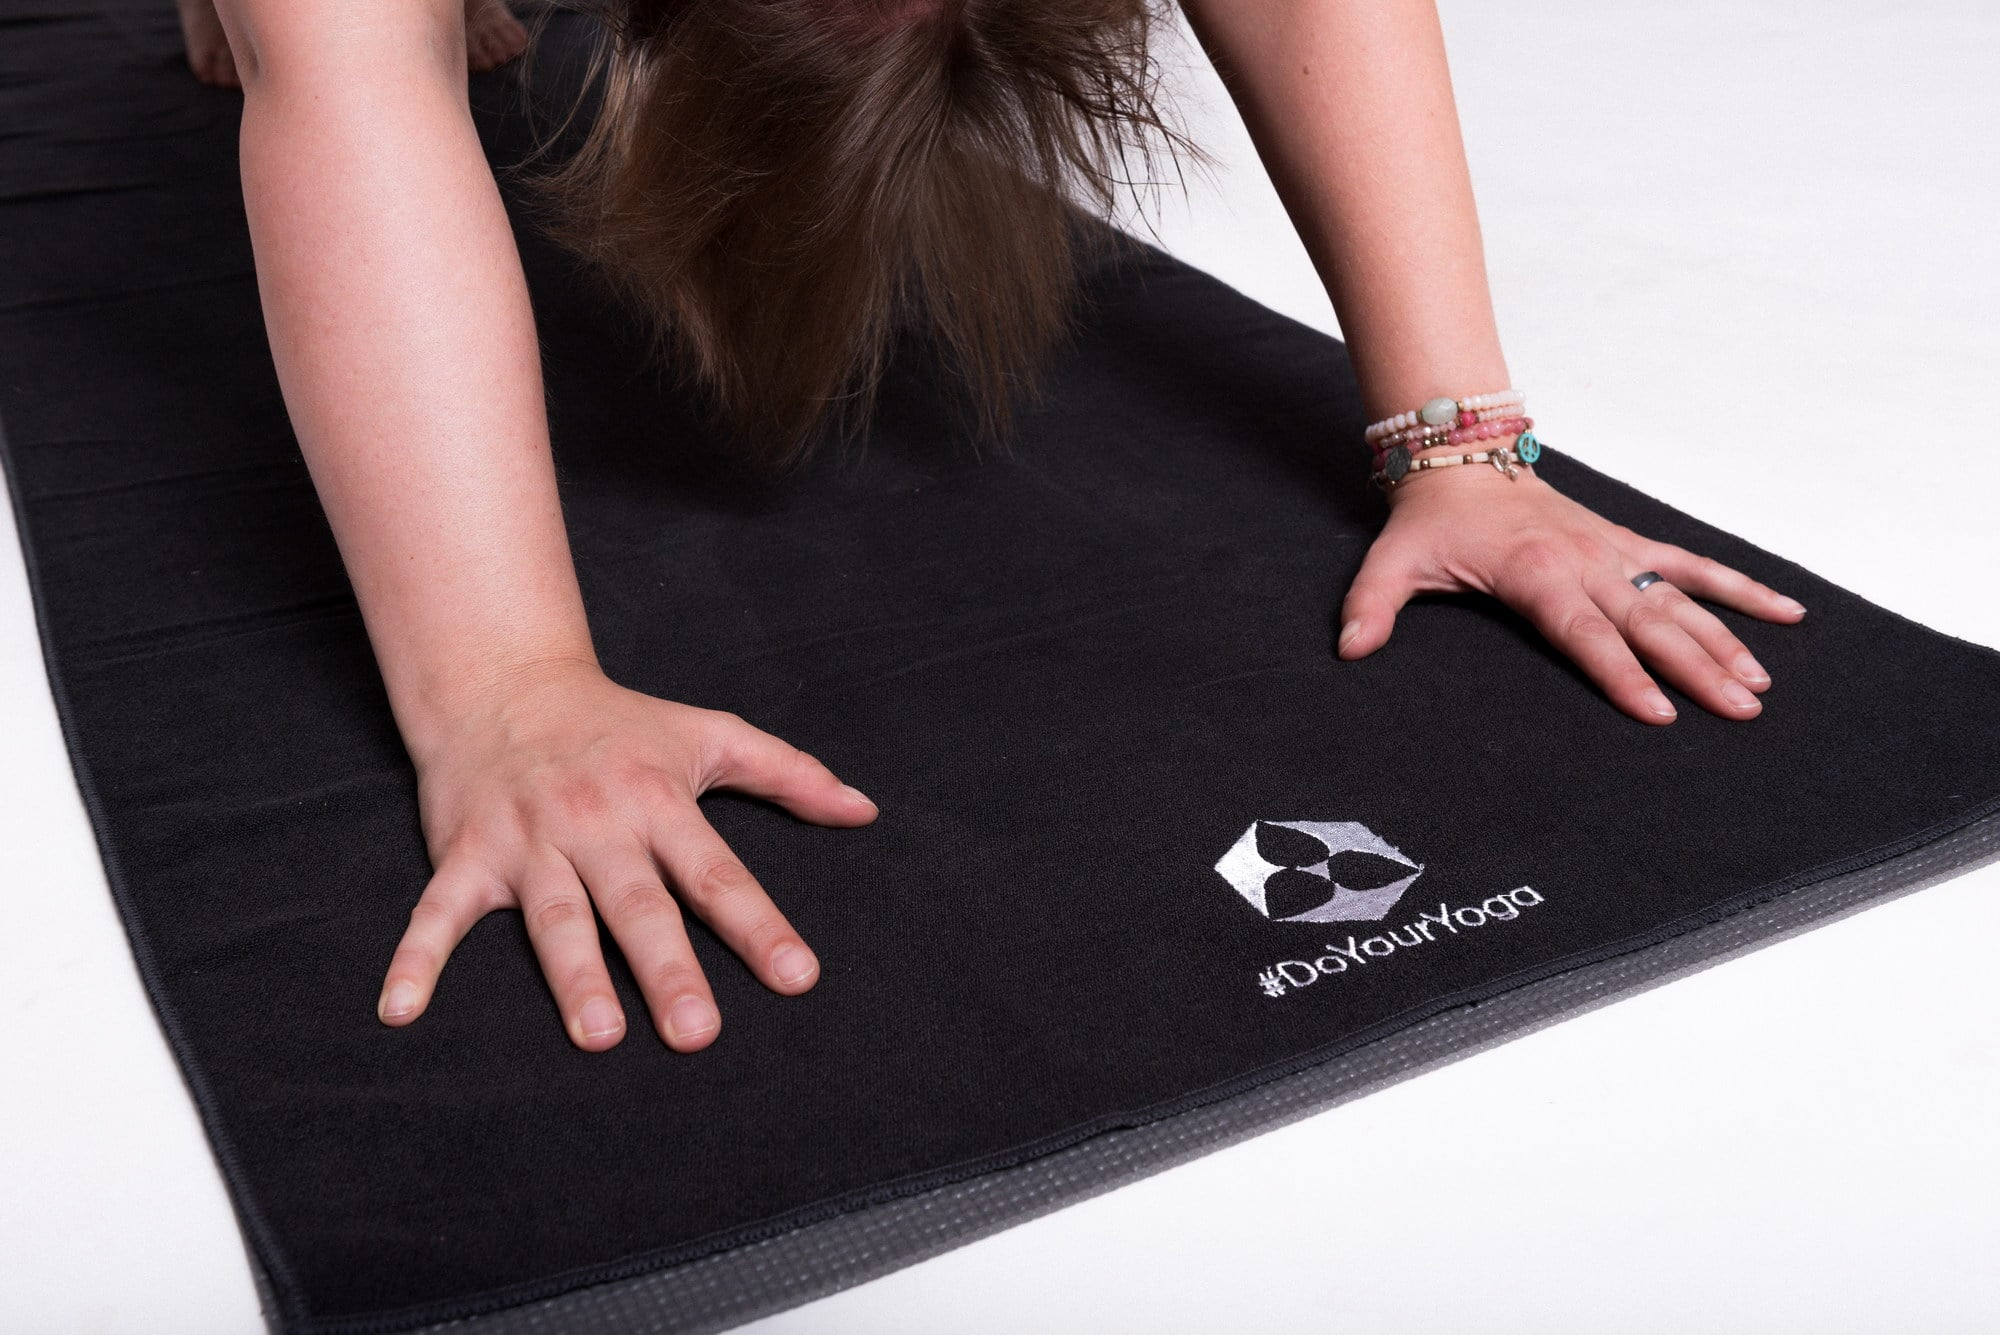 Yoga, Handtuch